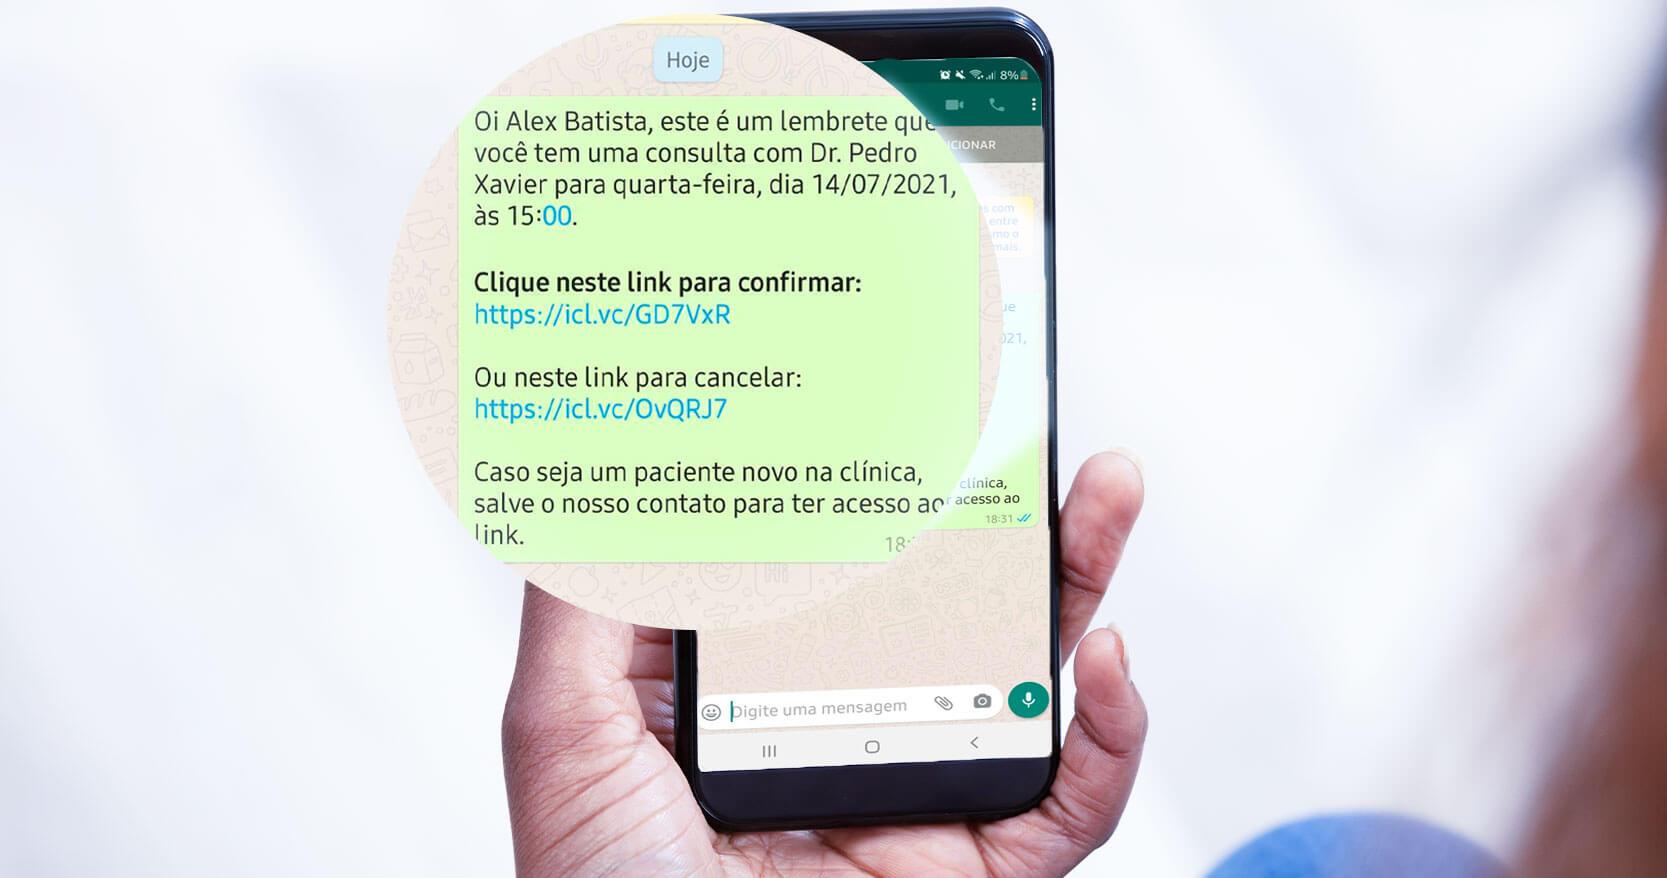 Lembretes de consulta por WhatsApp